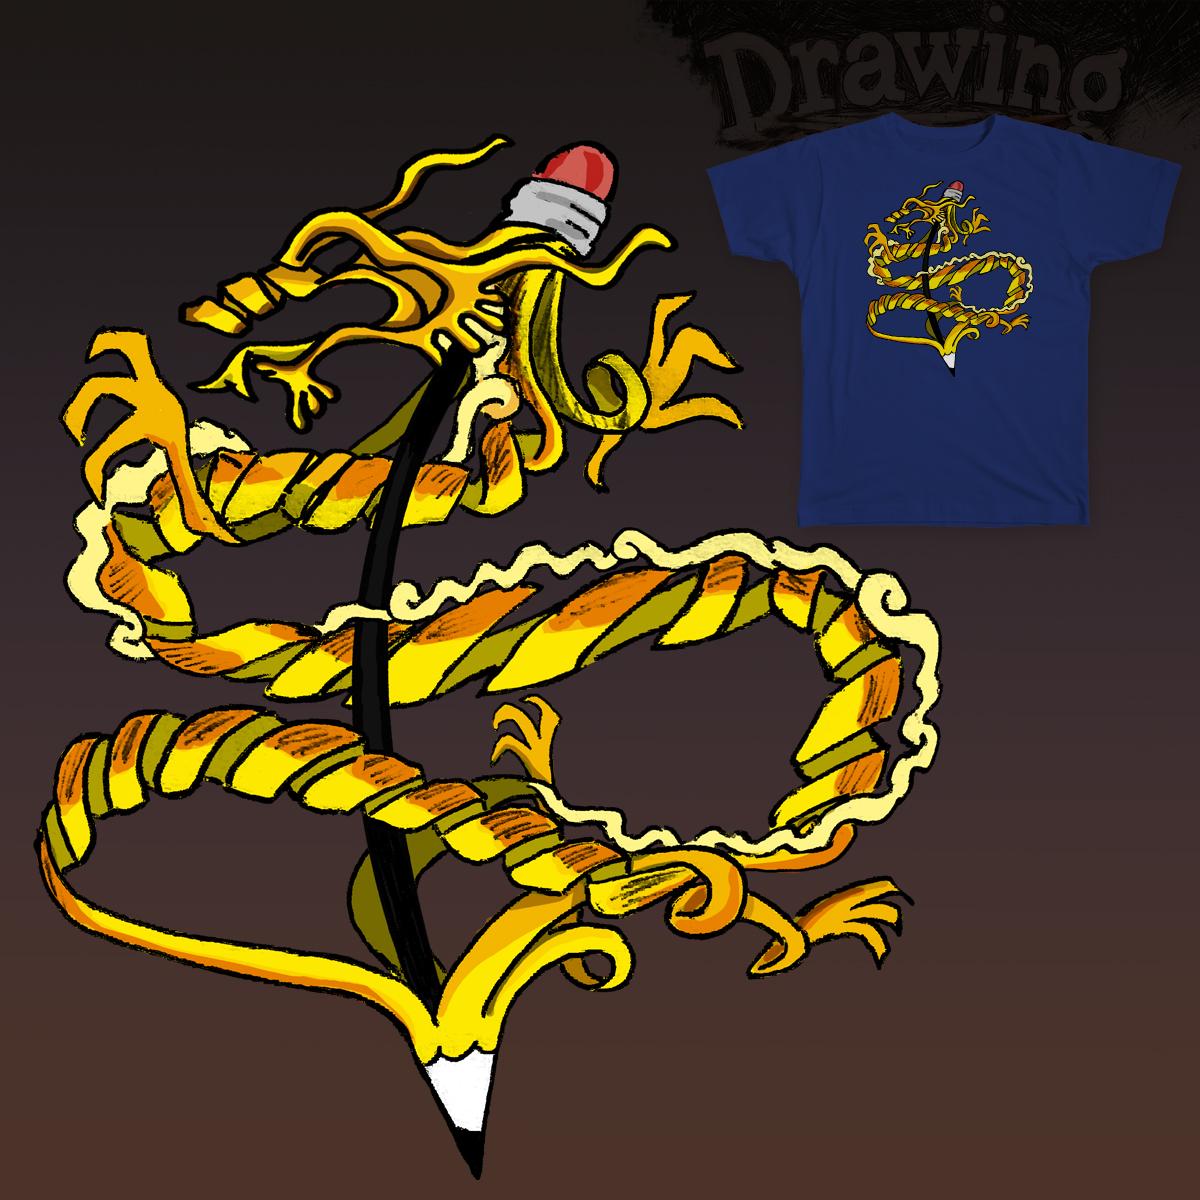 DRAwinGON by mutsu on Threadless